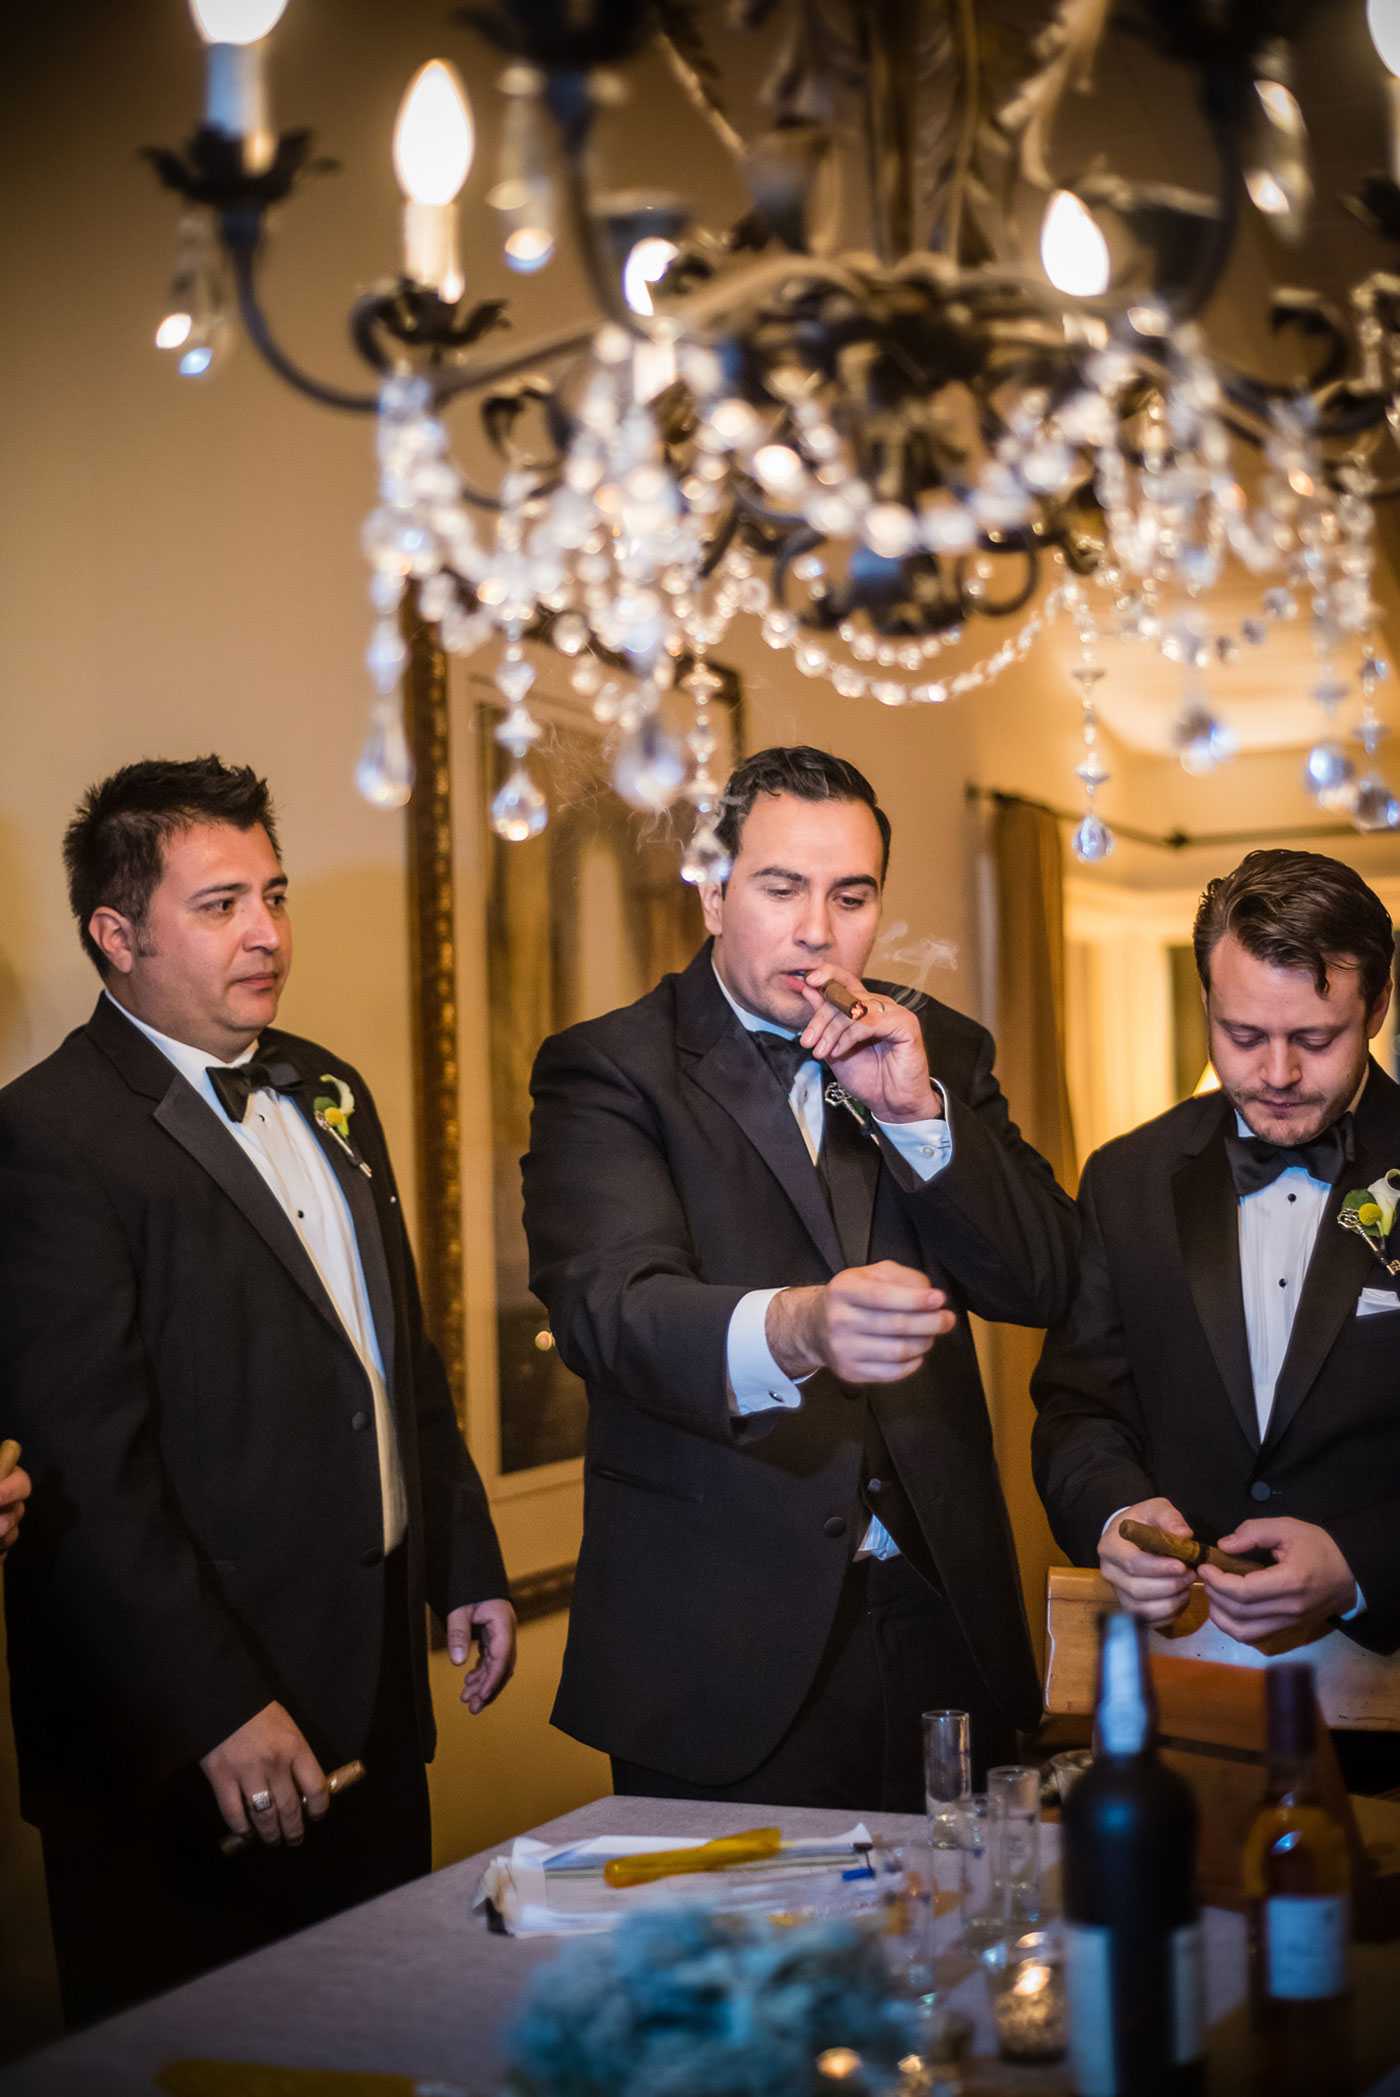 Monica-Oscar-Martinez-Wedding-491.jpg